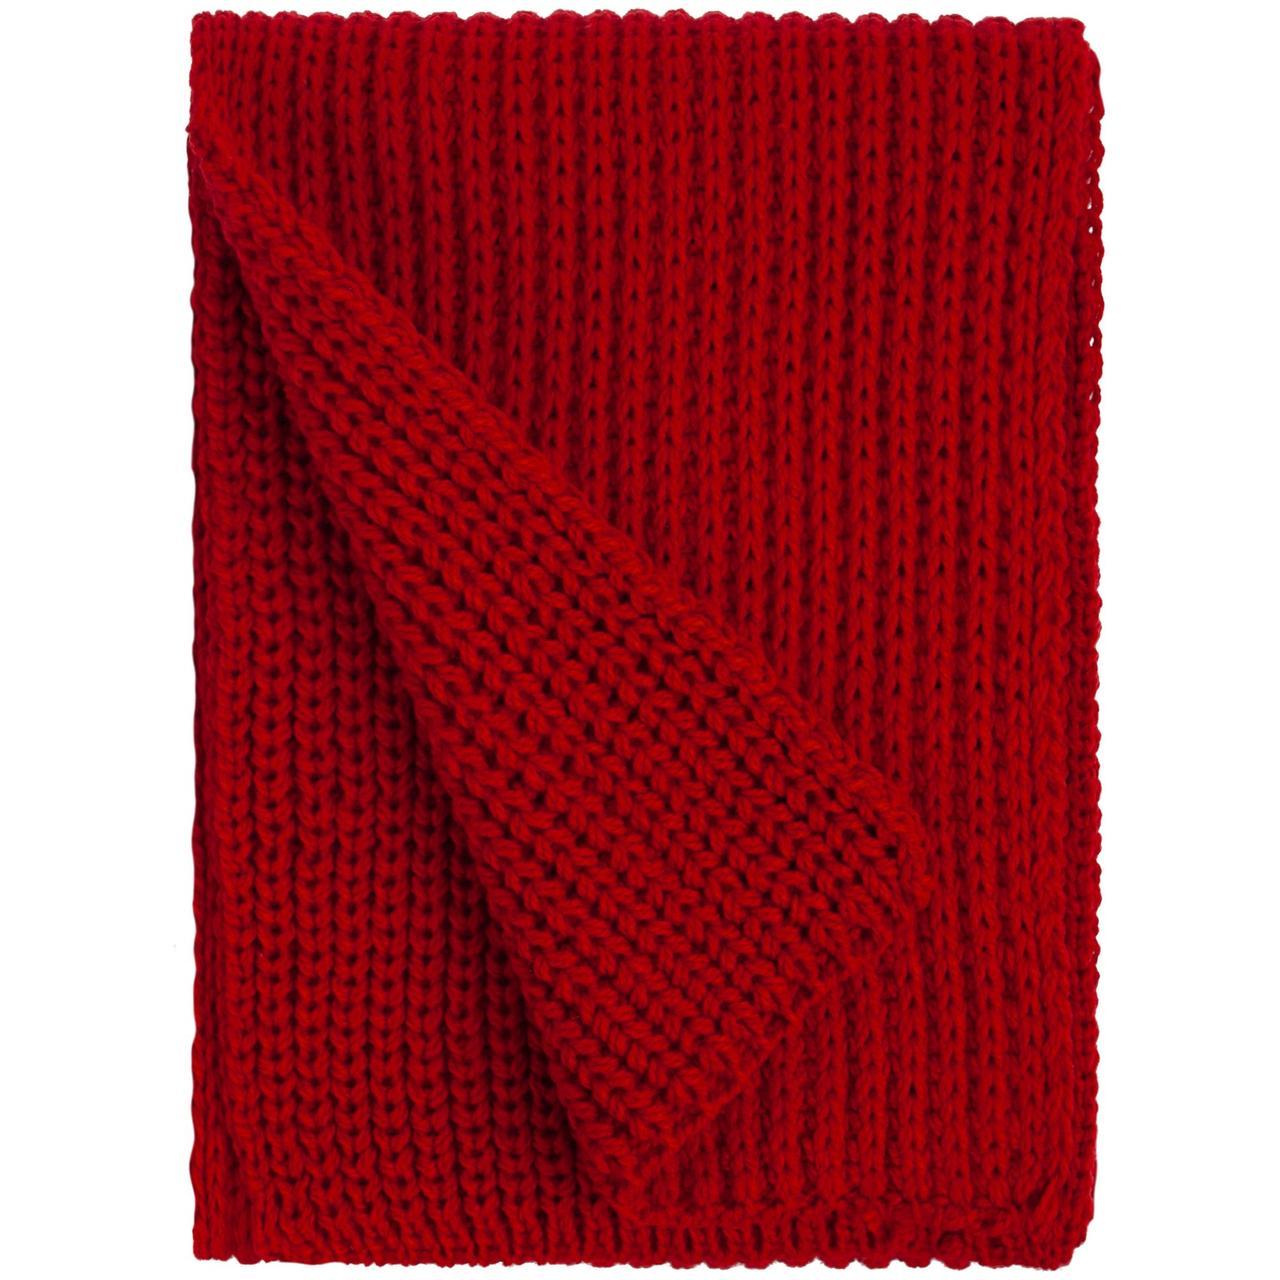 Шарф Nordkapp, красный (артикул 14402.50)